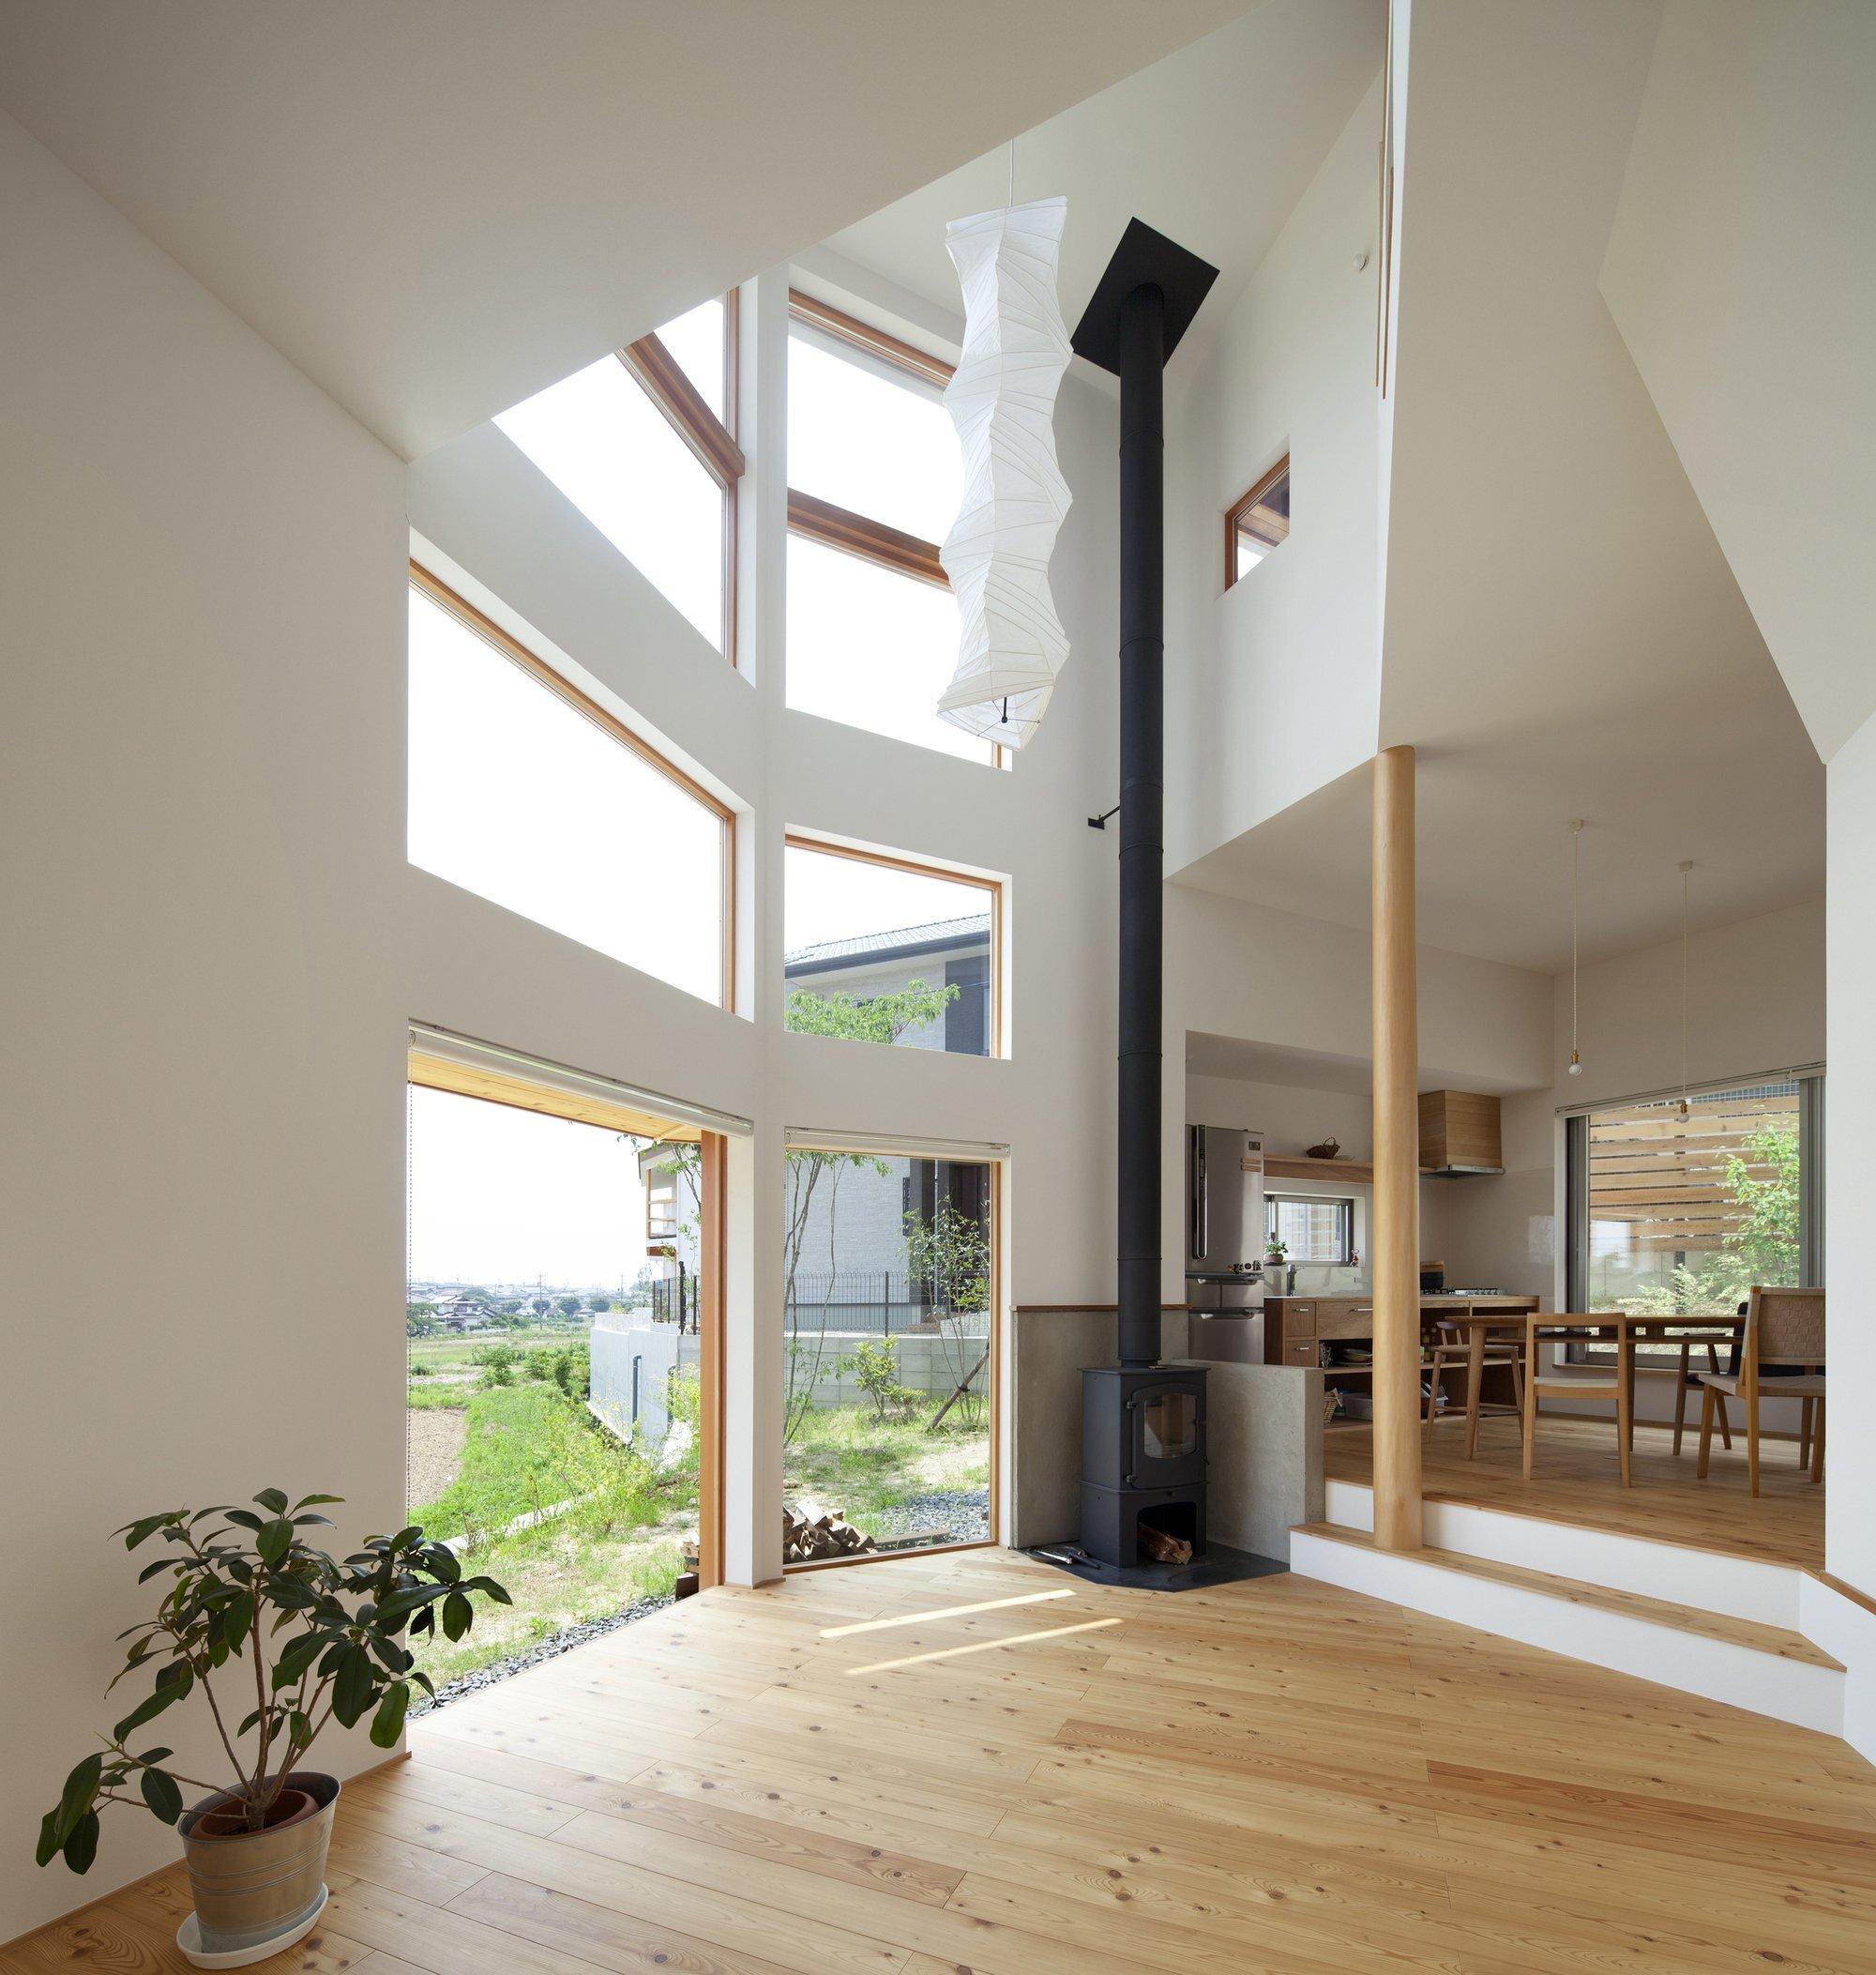 The Frontier House - Small Japanese House - Mamiya Shinichi Design Studio - Toyoake Japan - Living Area - Humble Homes